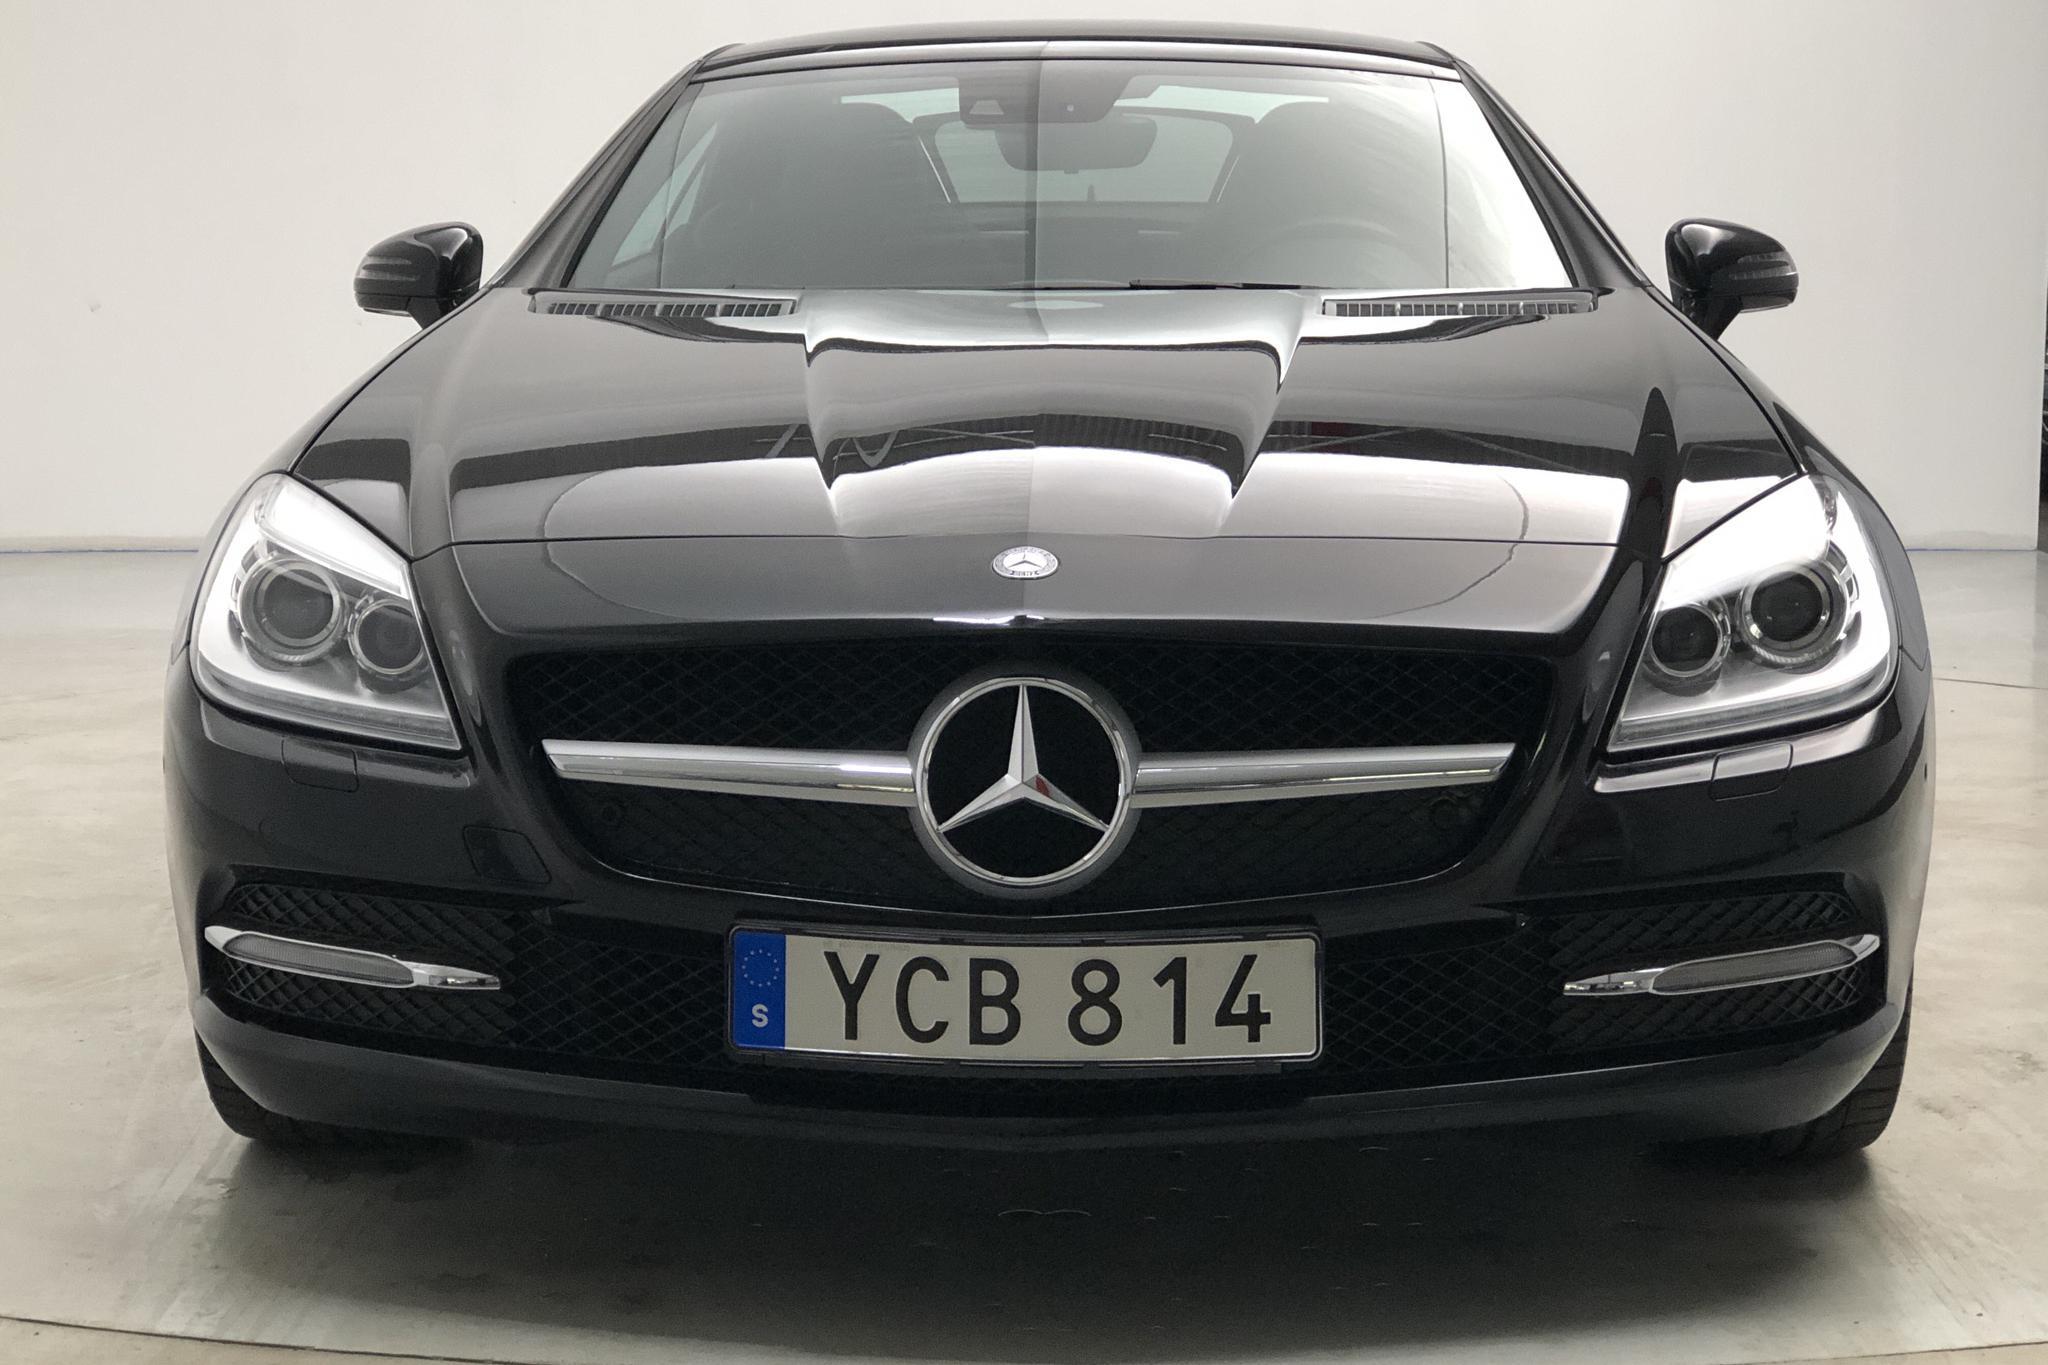 Mercedes SLK 350 V6 R172 (306hk) - 34 540 km - Automatic - black - 2012